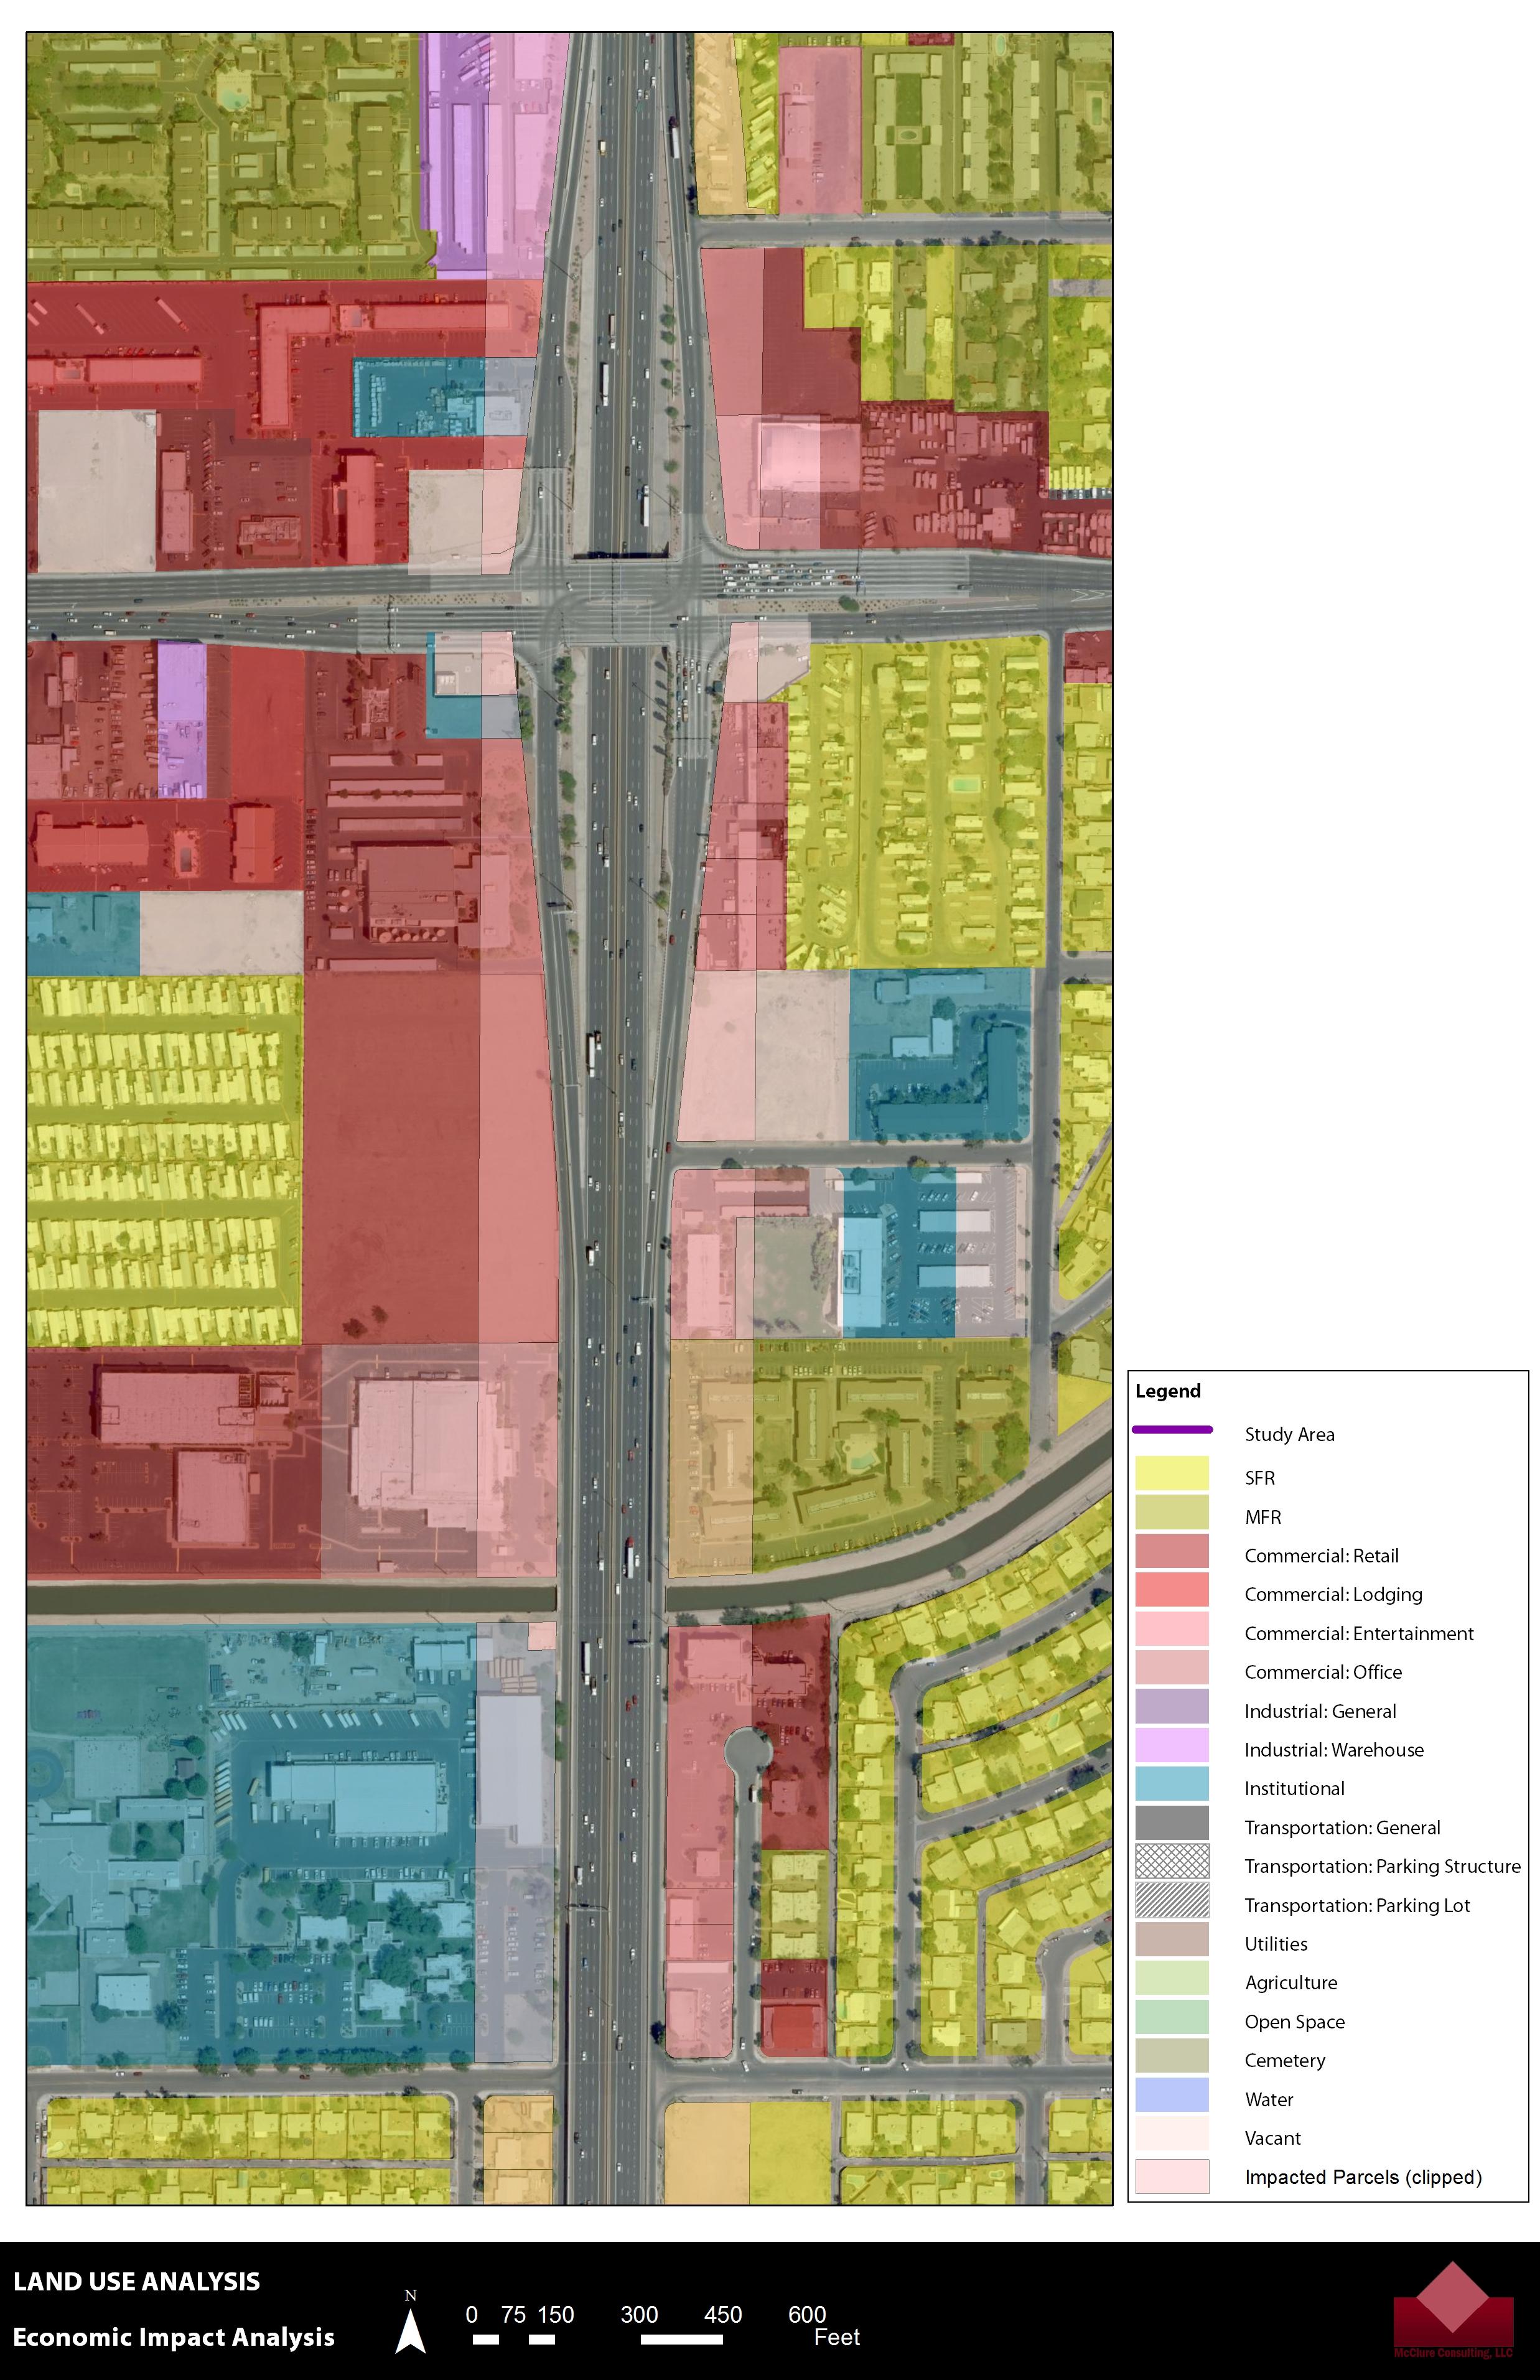 Land Use Exampl.jpg